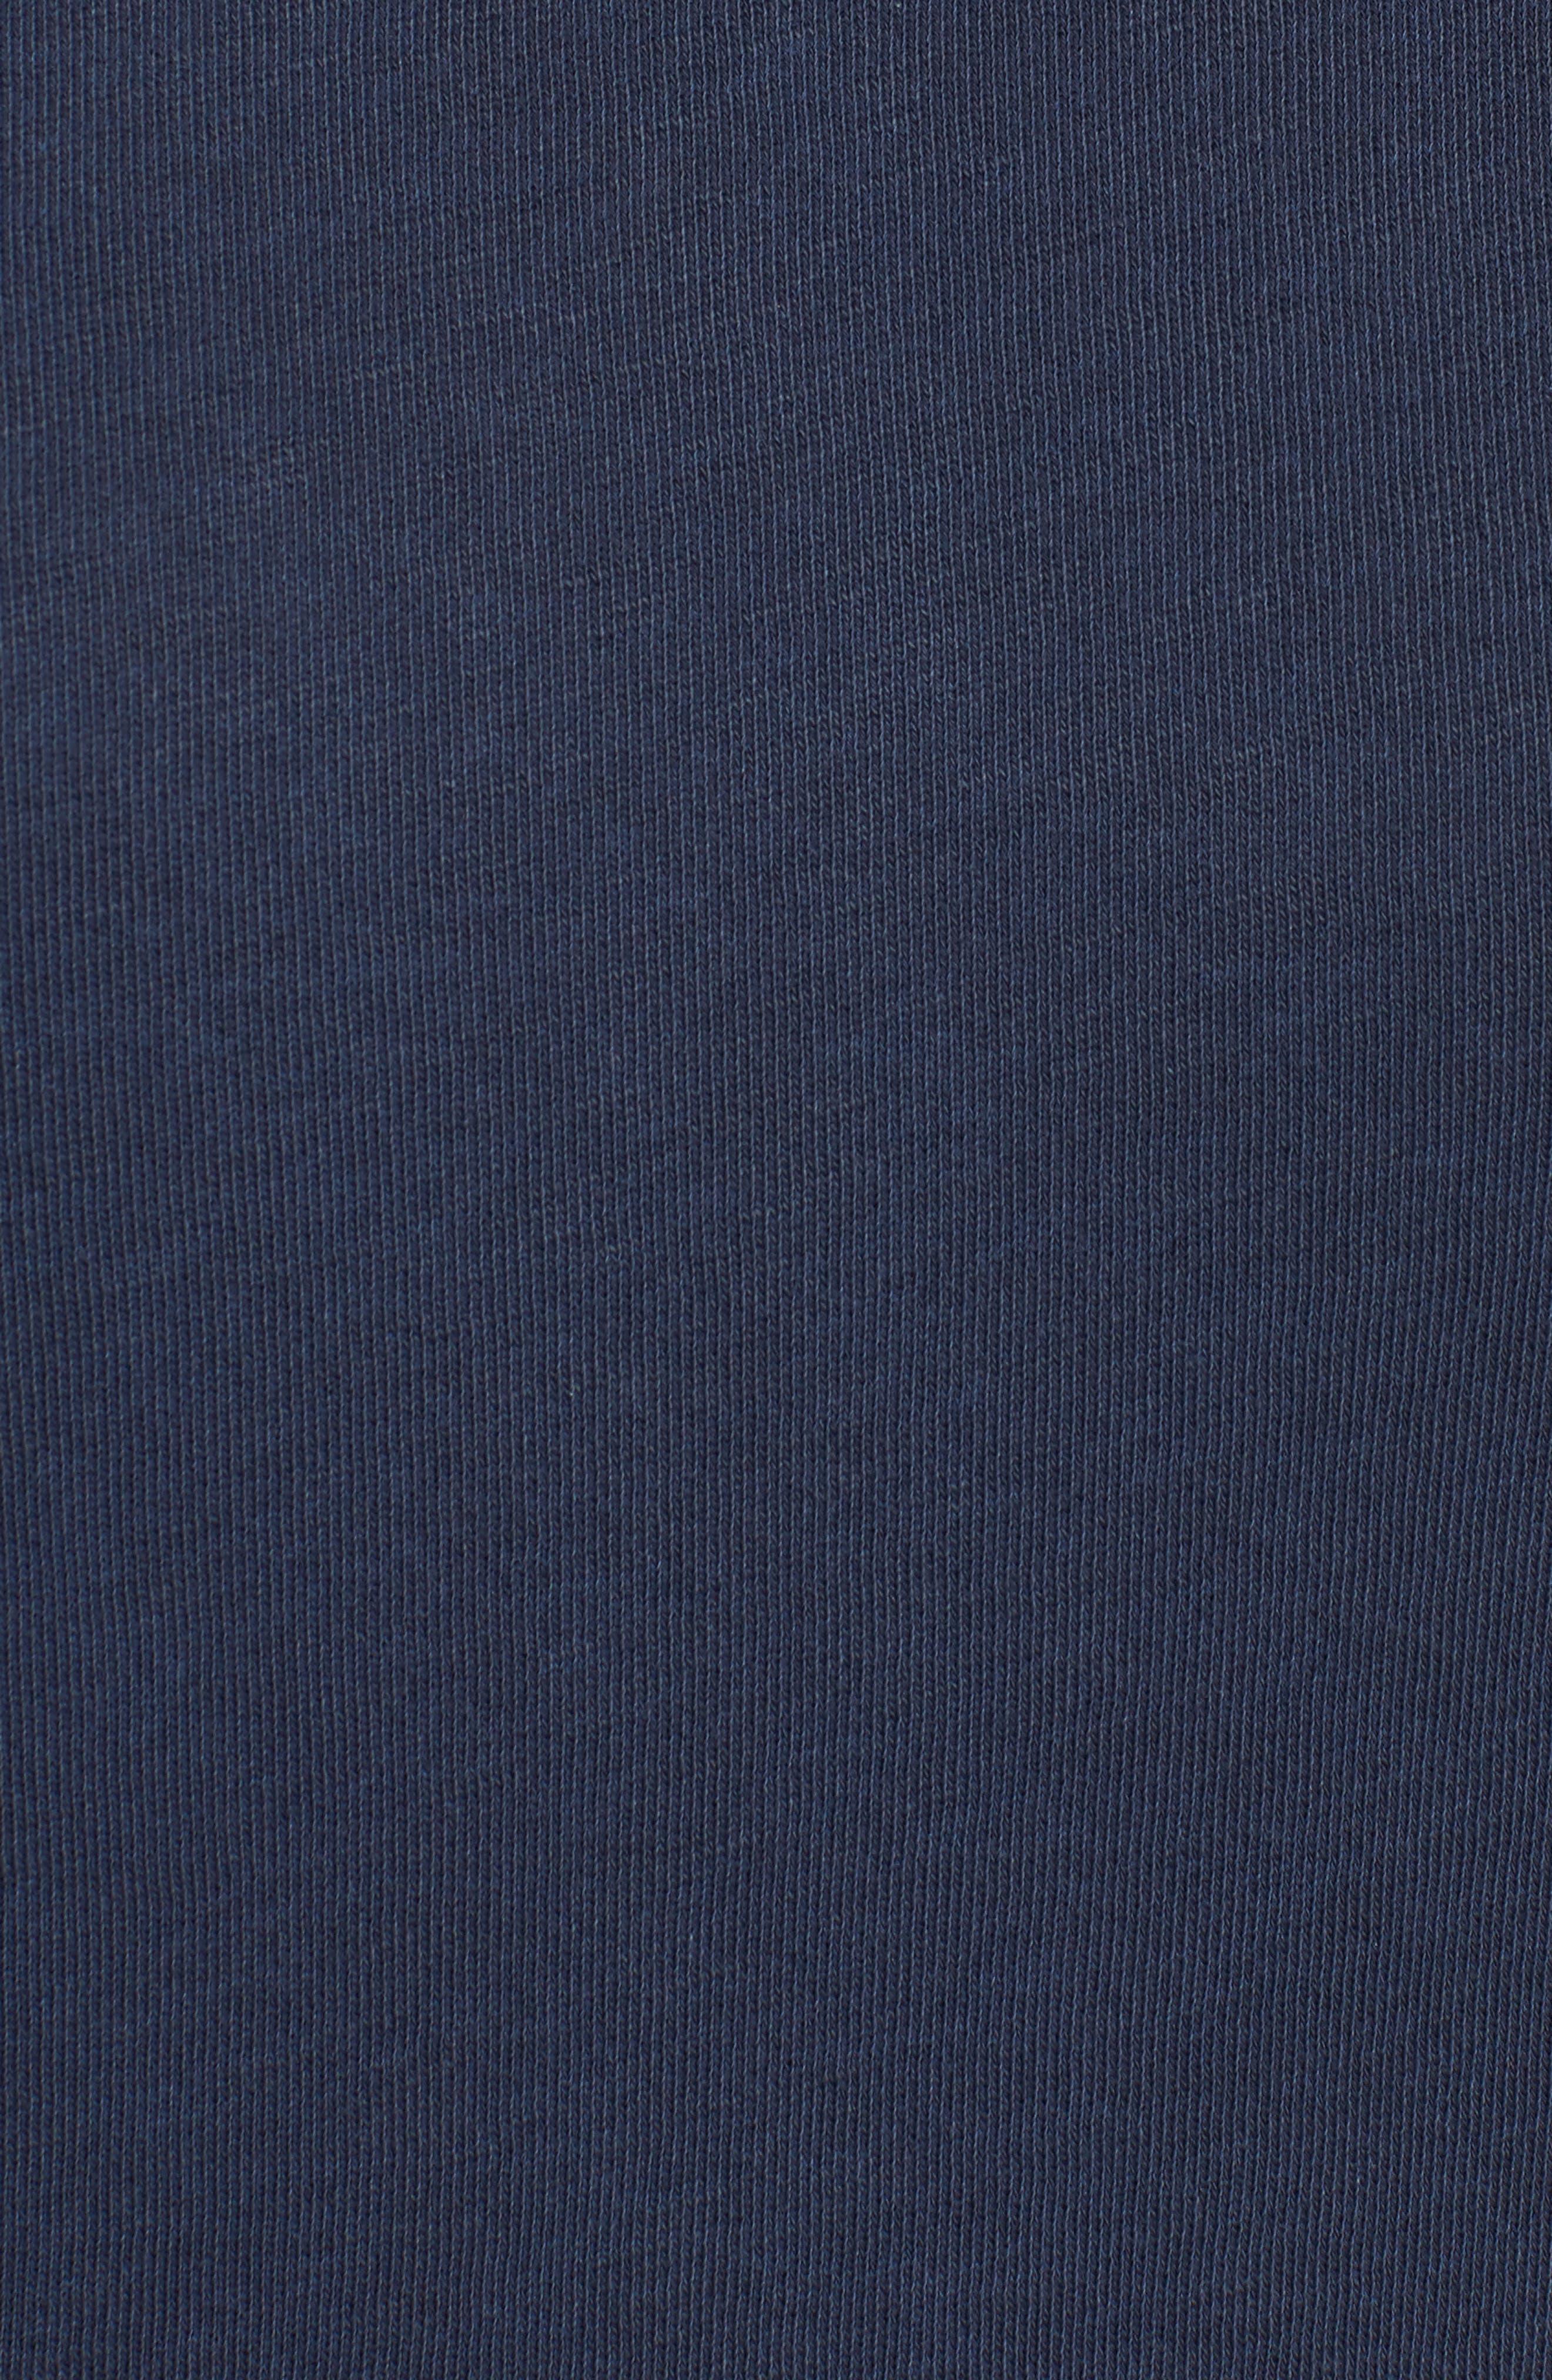 Alternate Image 5  - James Perse Raglan Sleeve Sweatshirt Dress